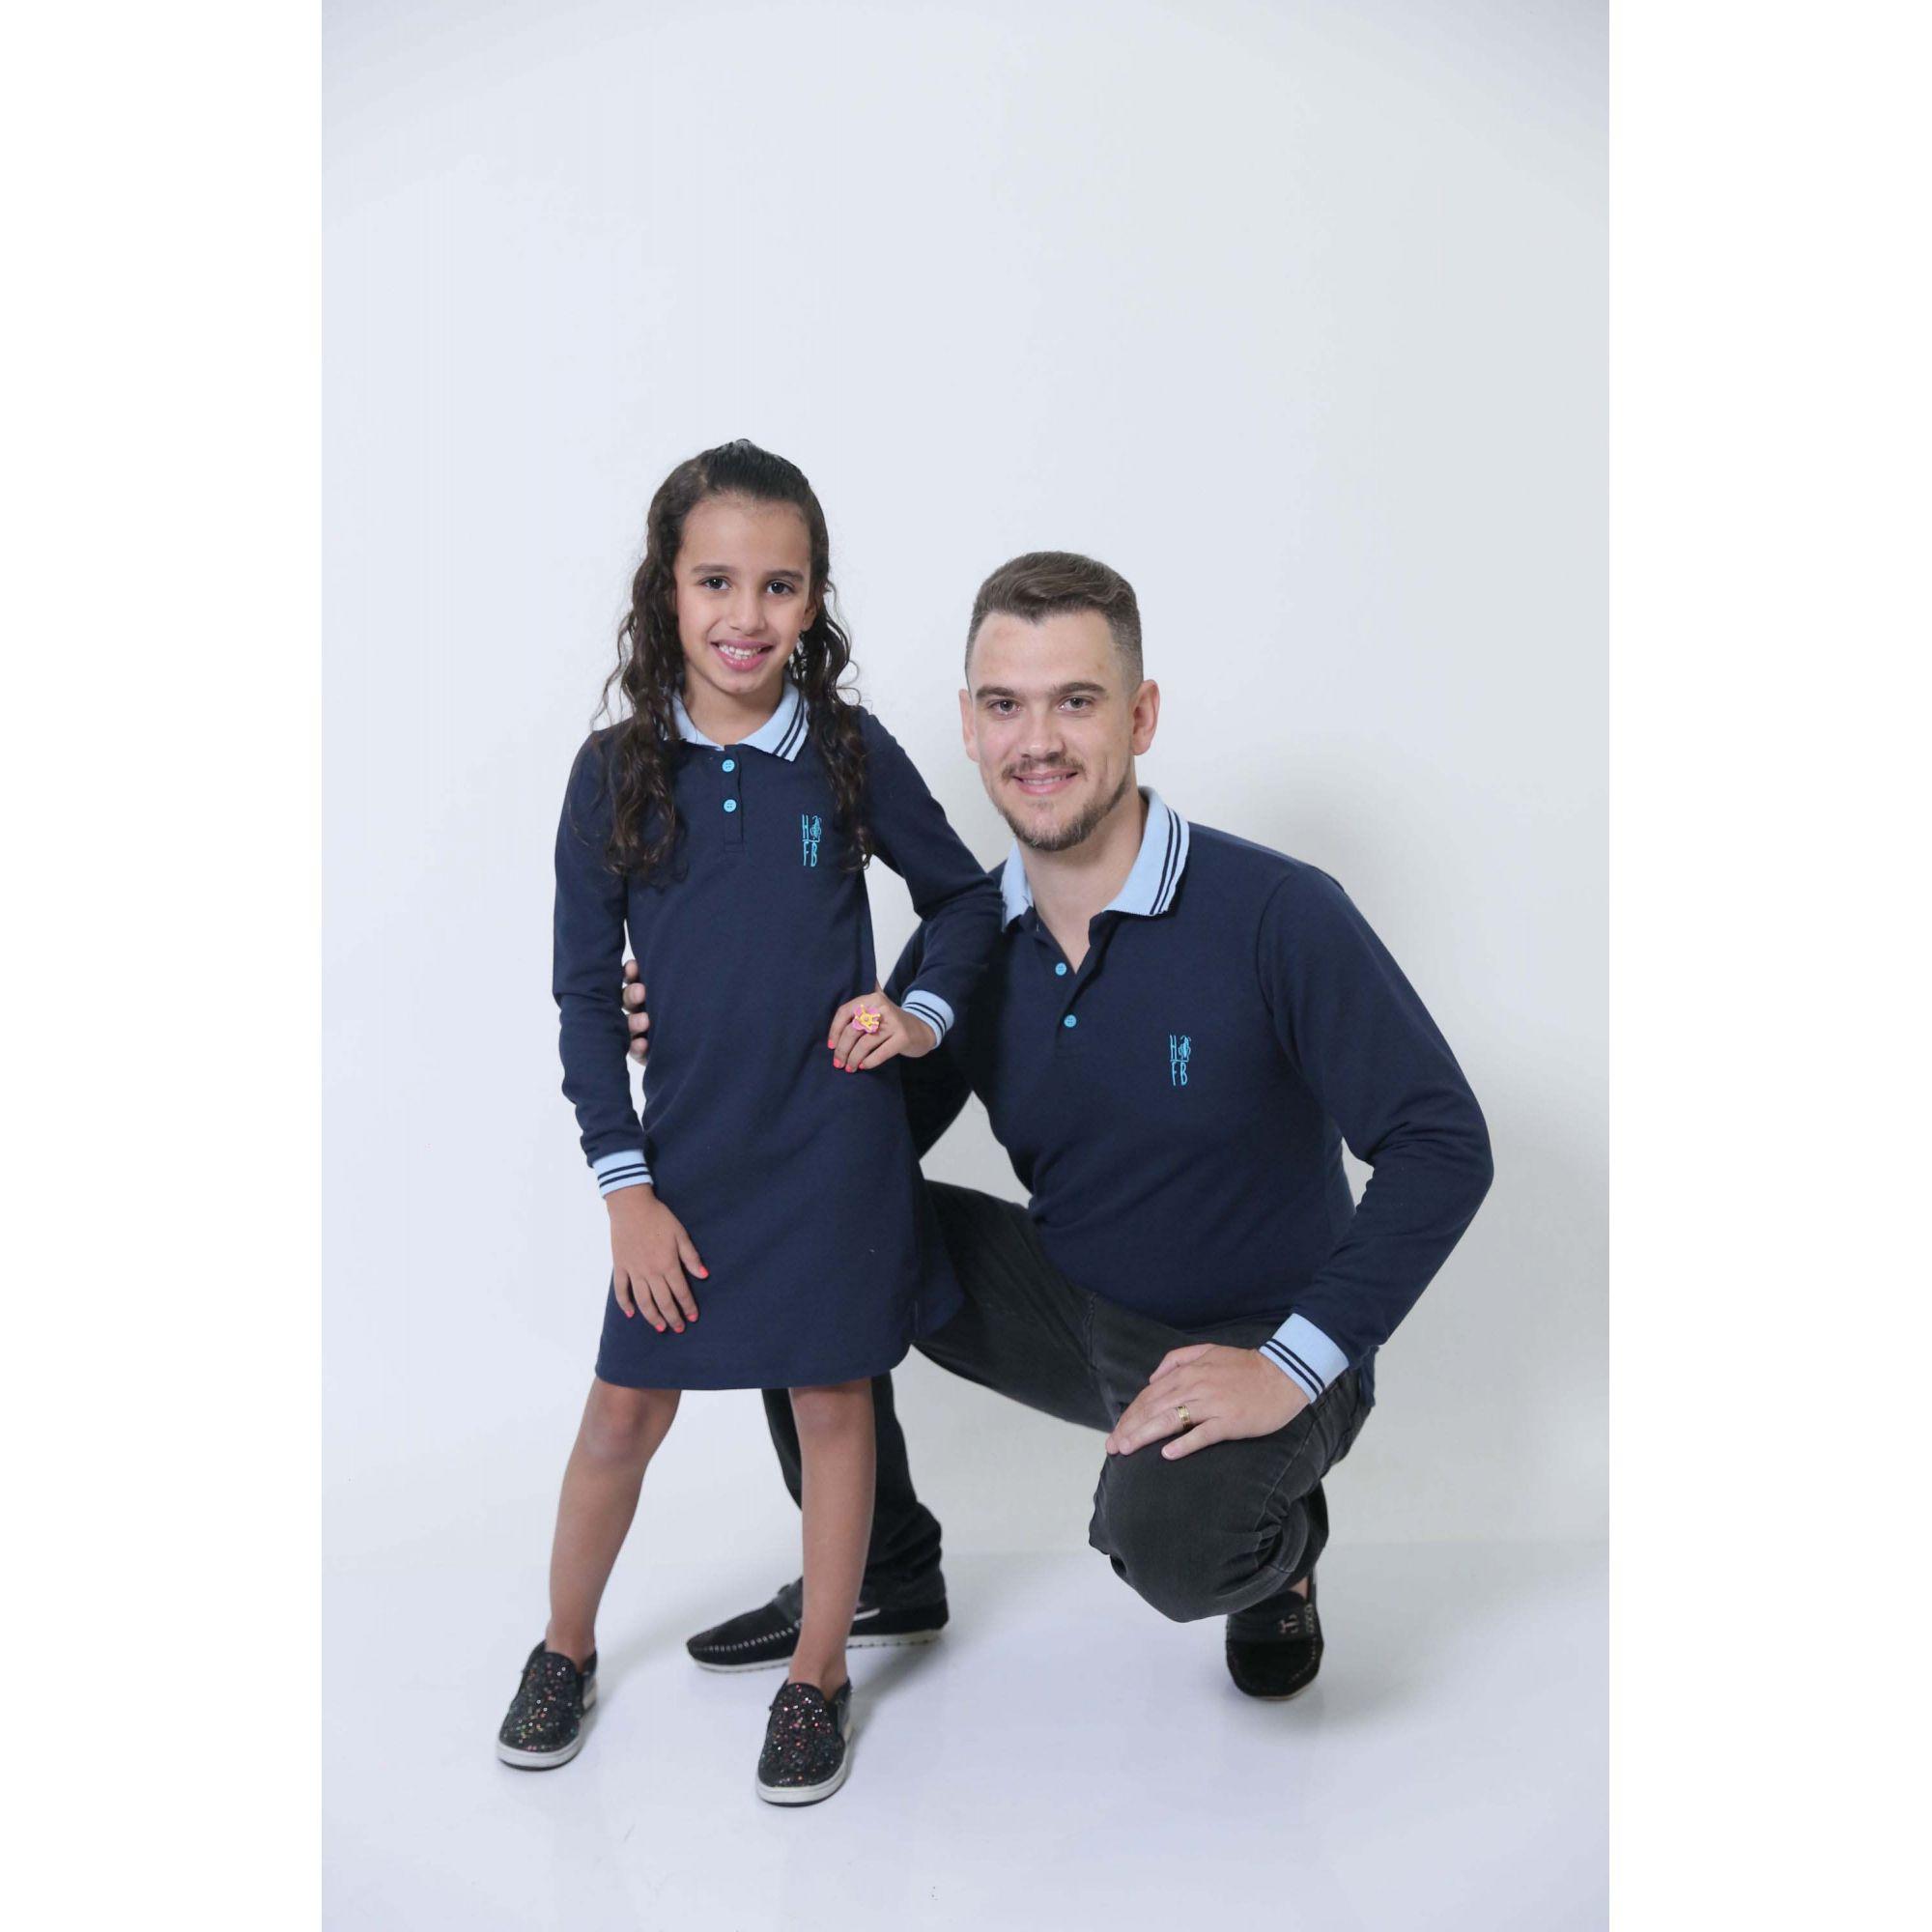 PAI E FILHA > Kit 02 Peças Camisa + Vestido Polo Infantil Azul Manga Longa [Coleção Tal Pai Tal Filho]  - Heitor Fashion Brazil